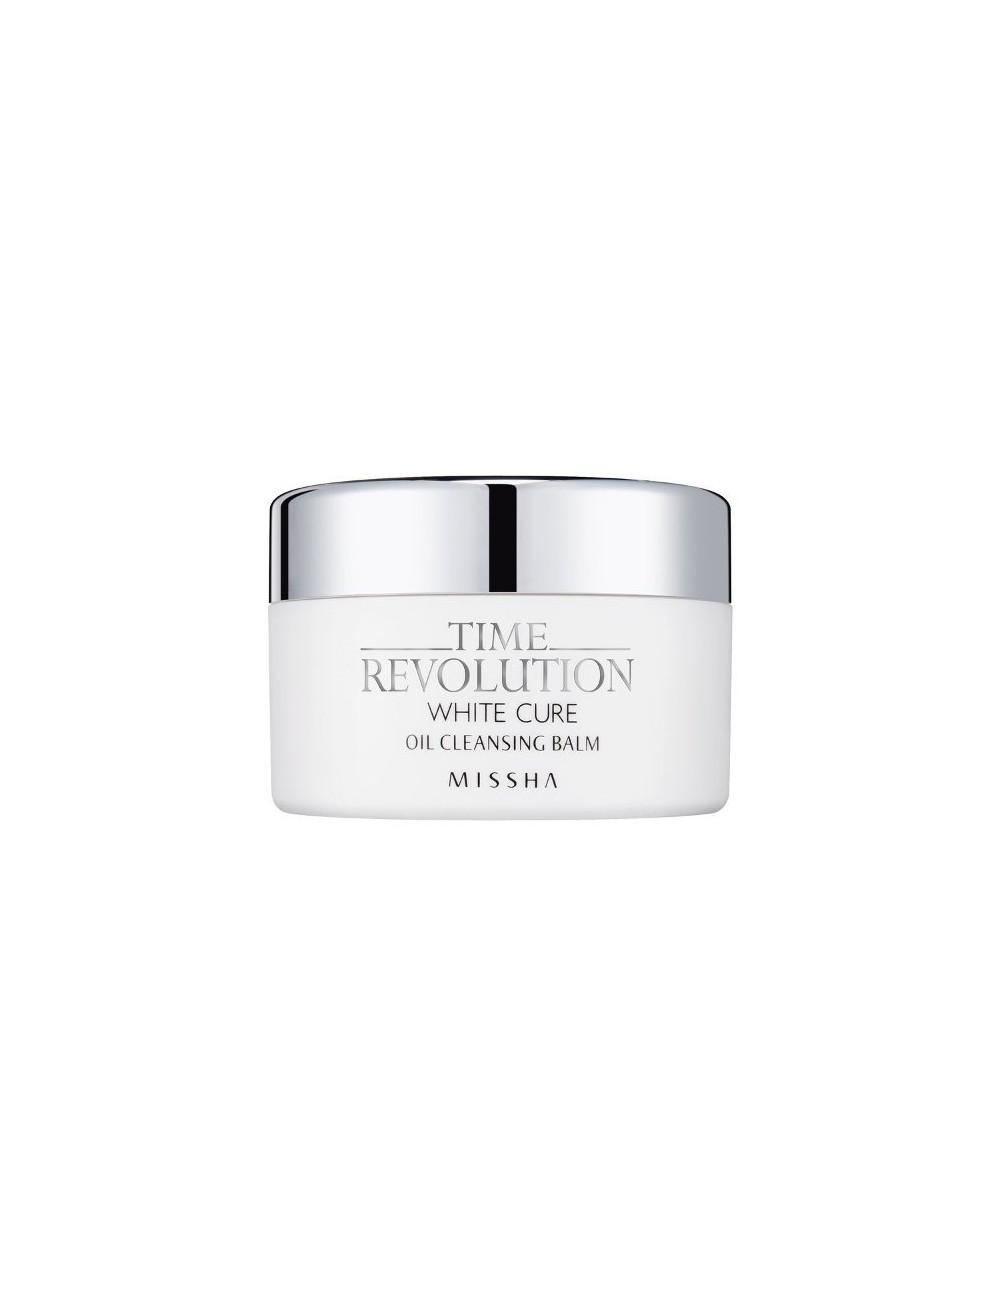 Aceite Limpiador y Desmaquillante Missha Time Revolution White Cure Oil Cleansing Balm